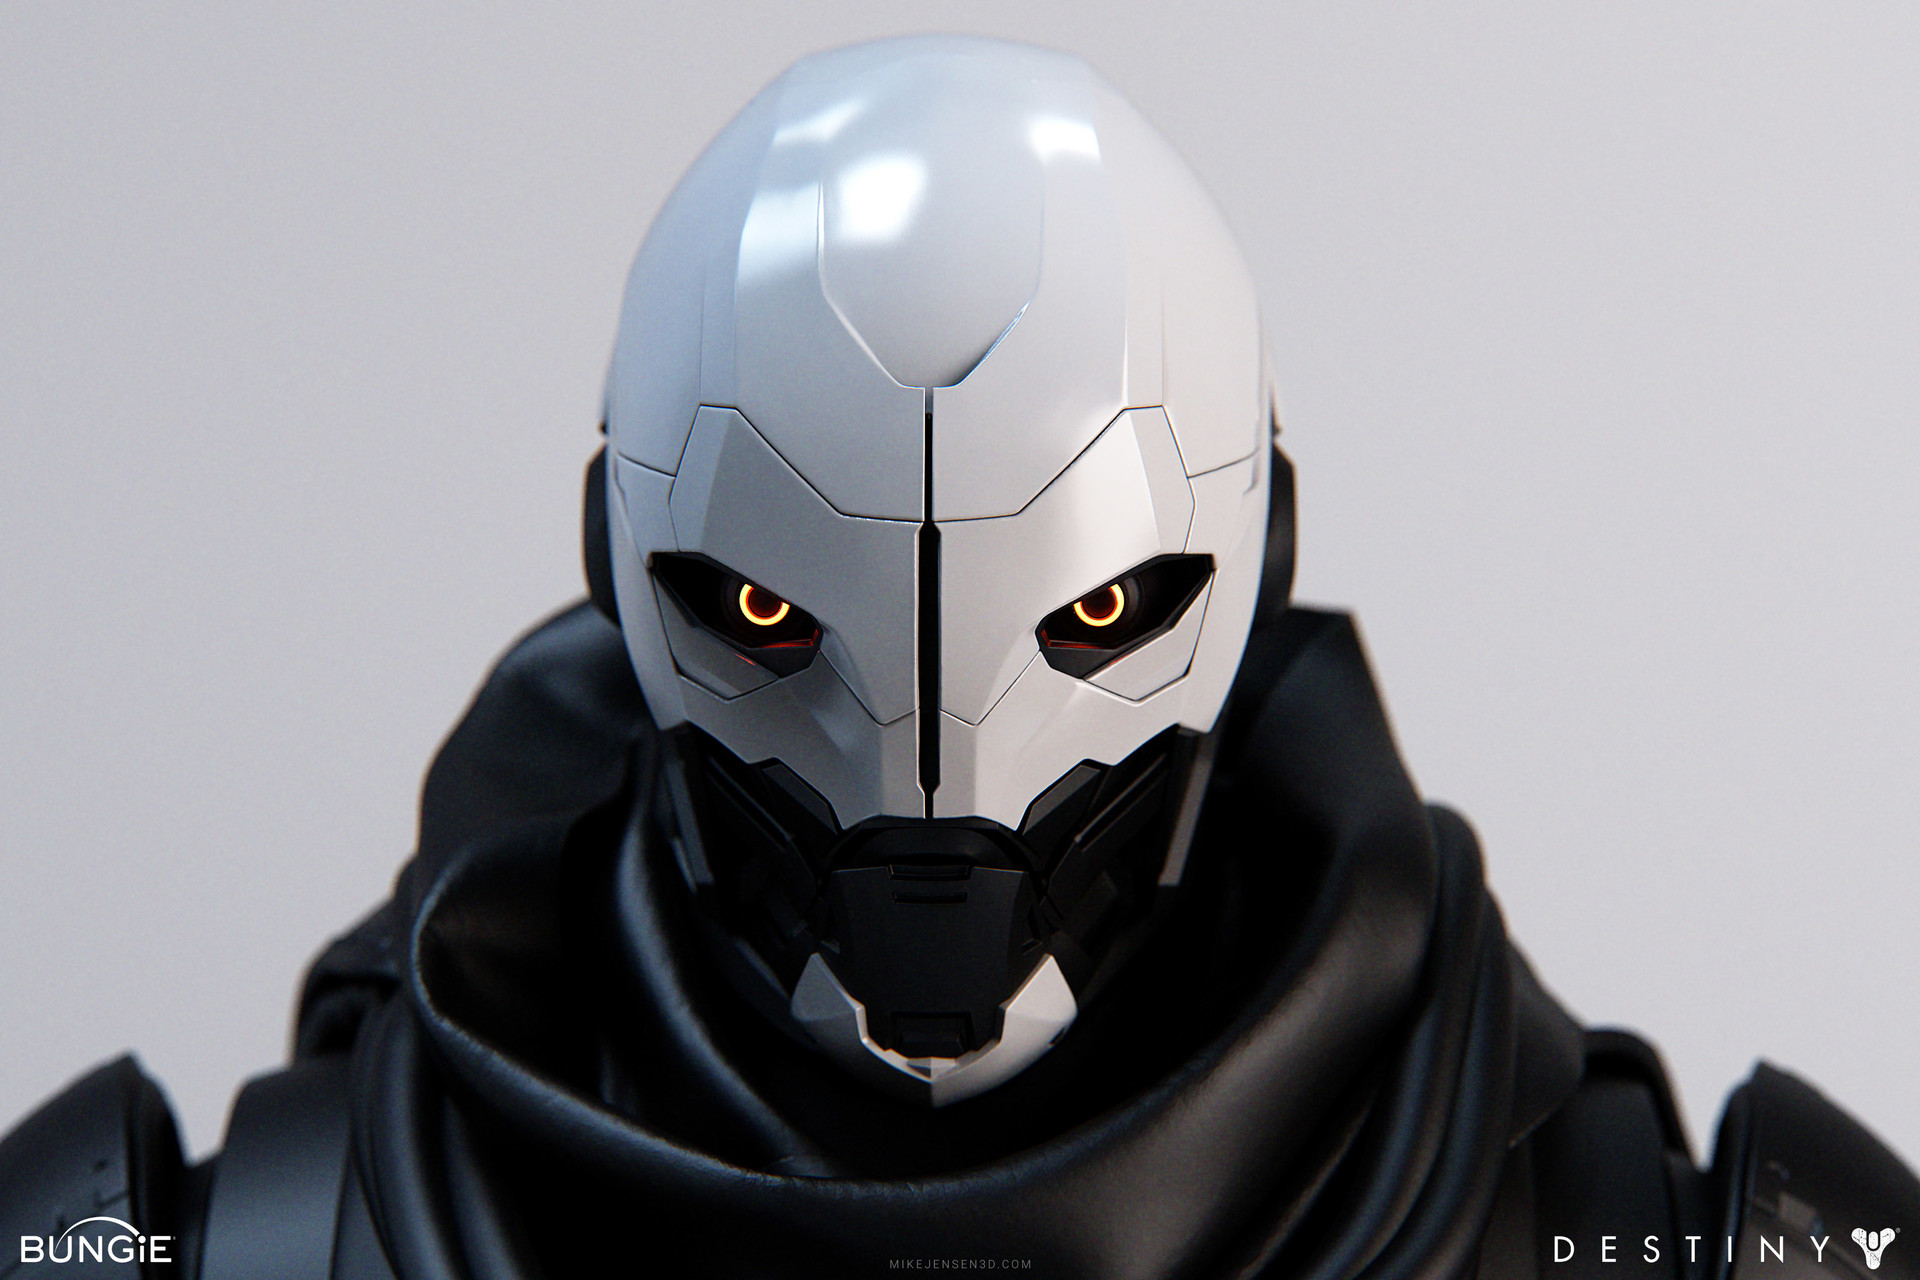 Destiny Character Artwork by Mike Jensen